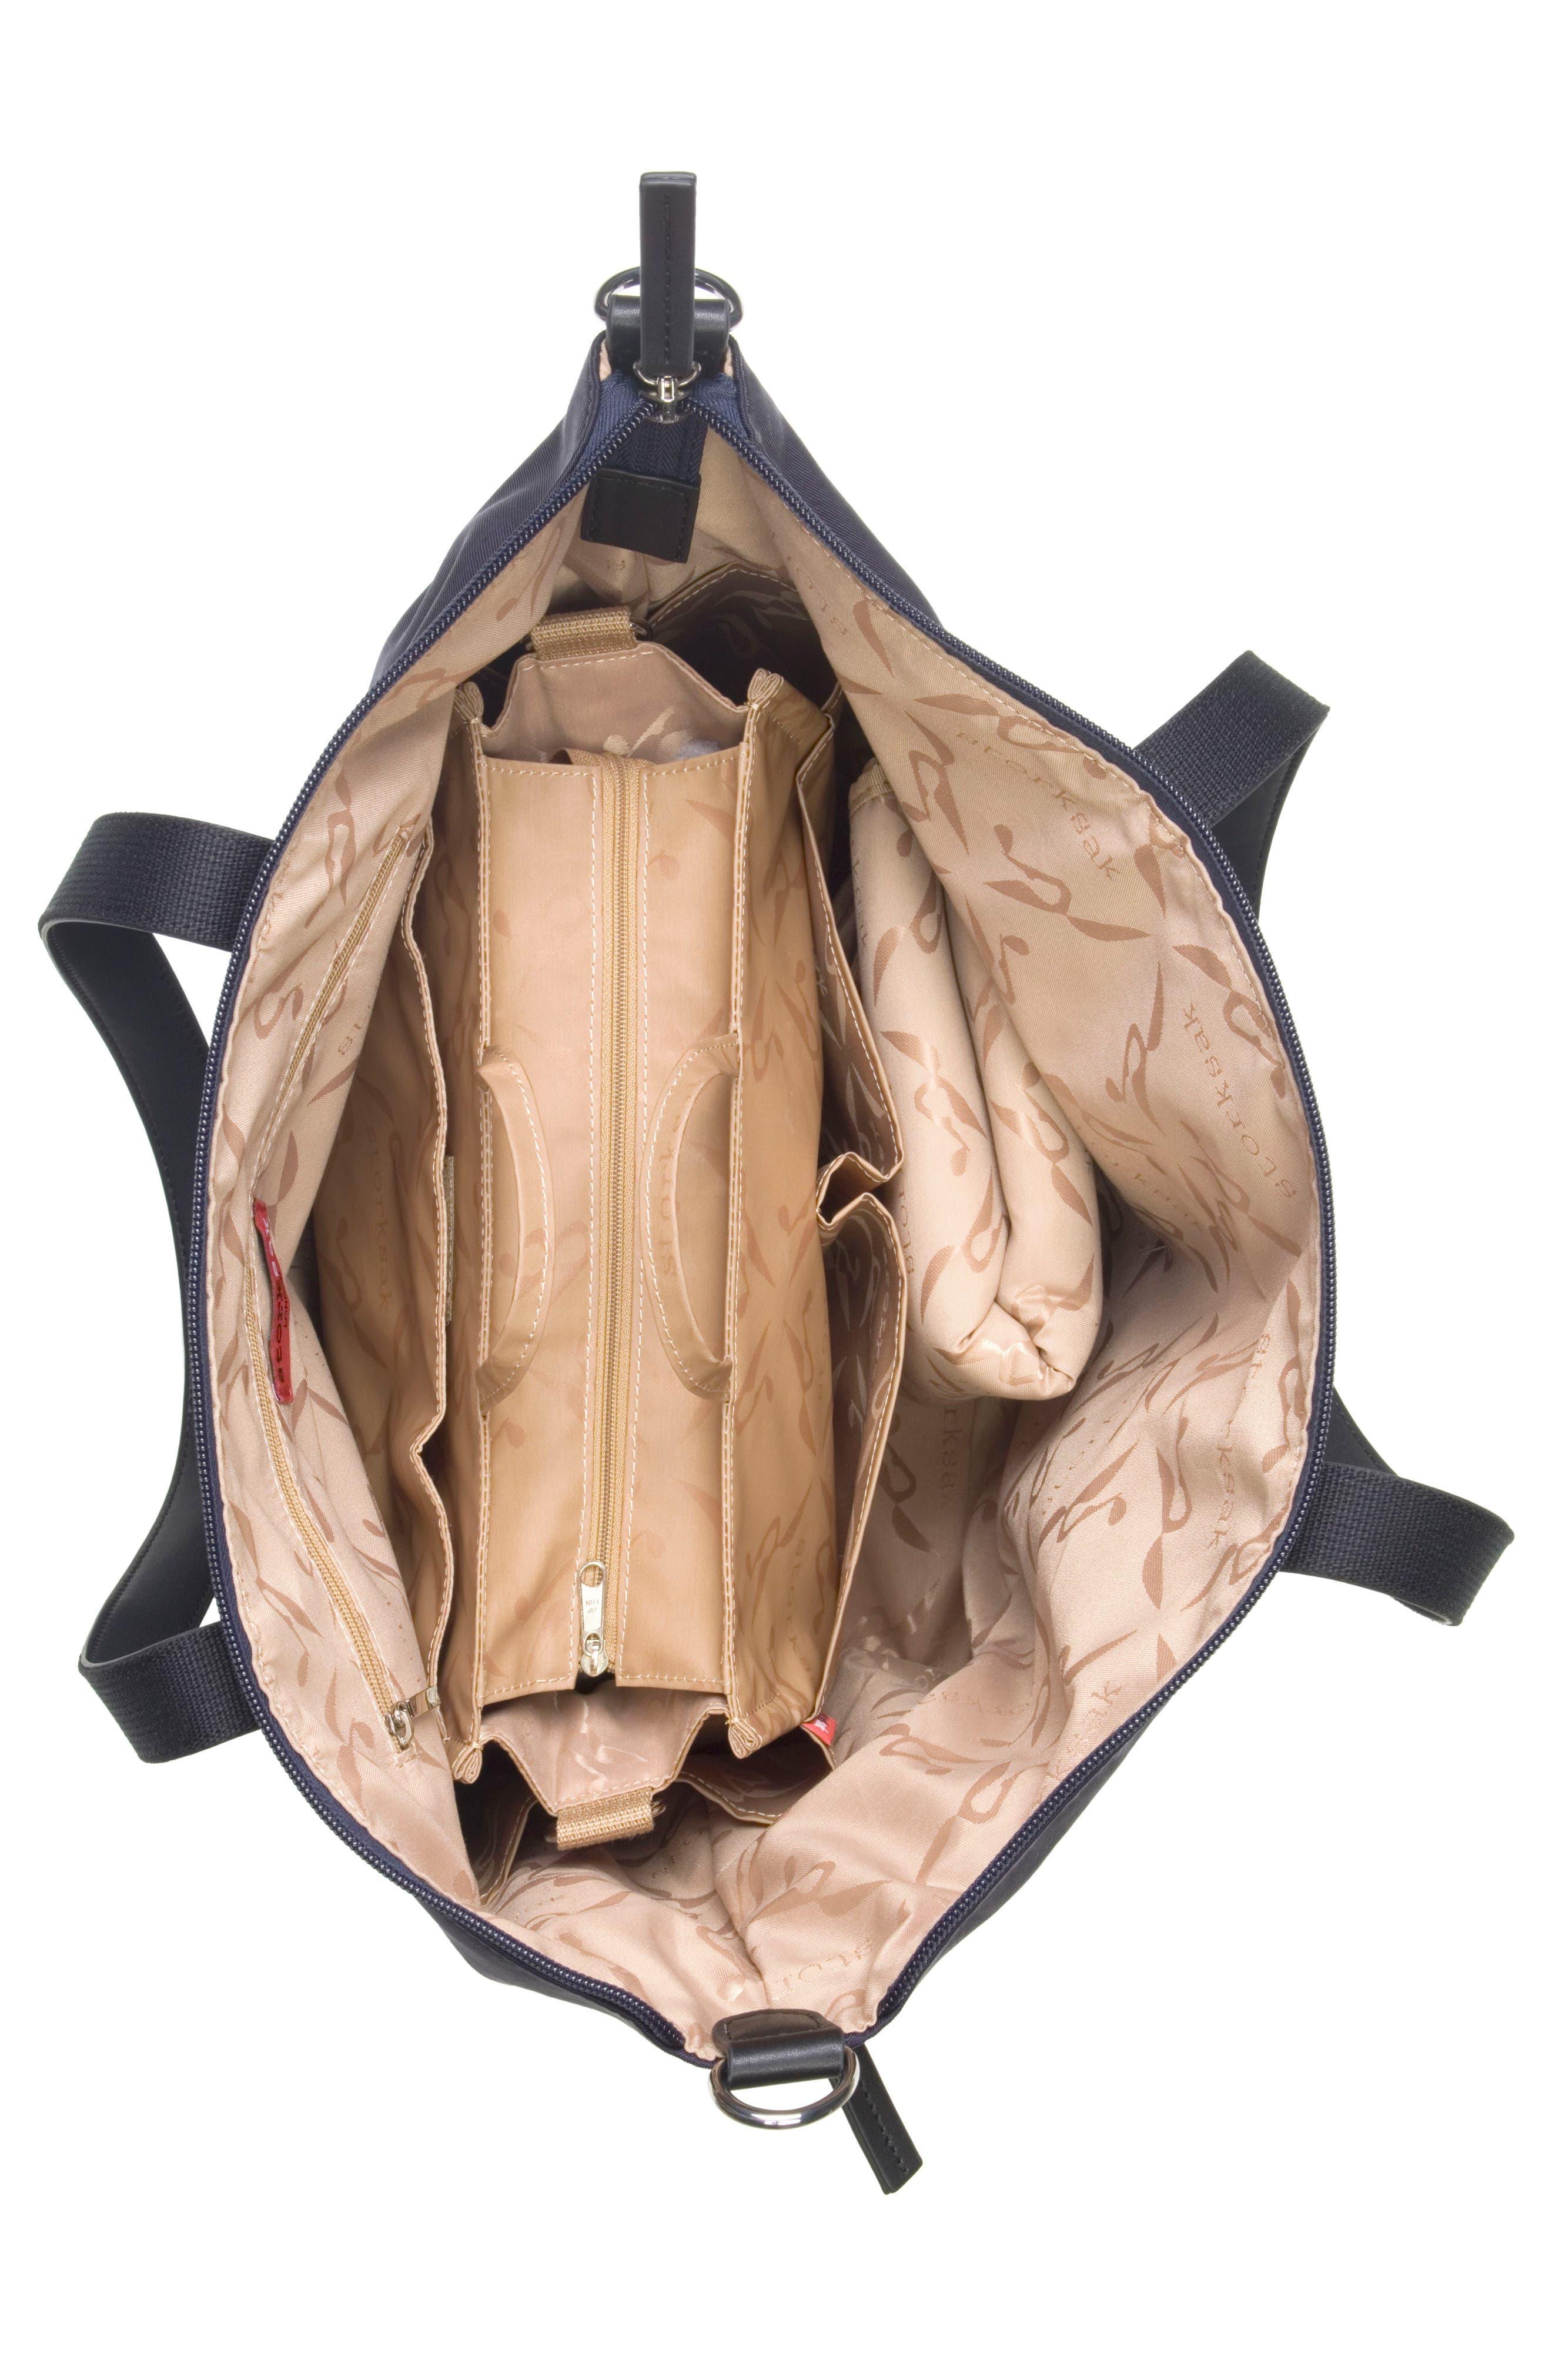 Noa Luxe Diaper Bag,                             Alternate thumbnail 4, color,                             410